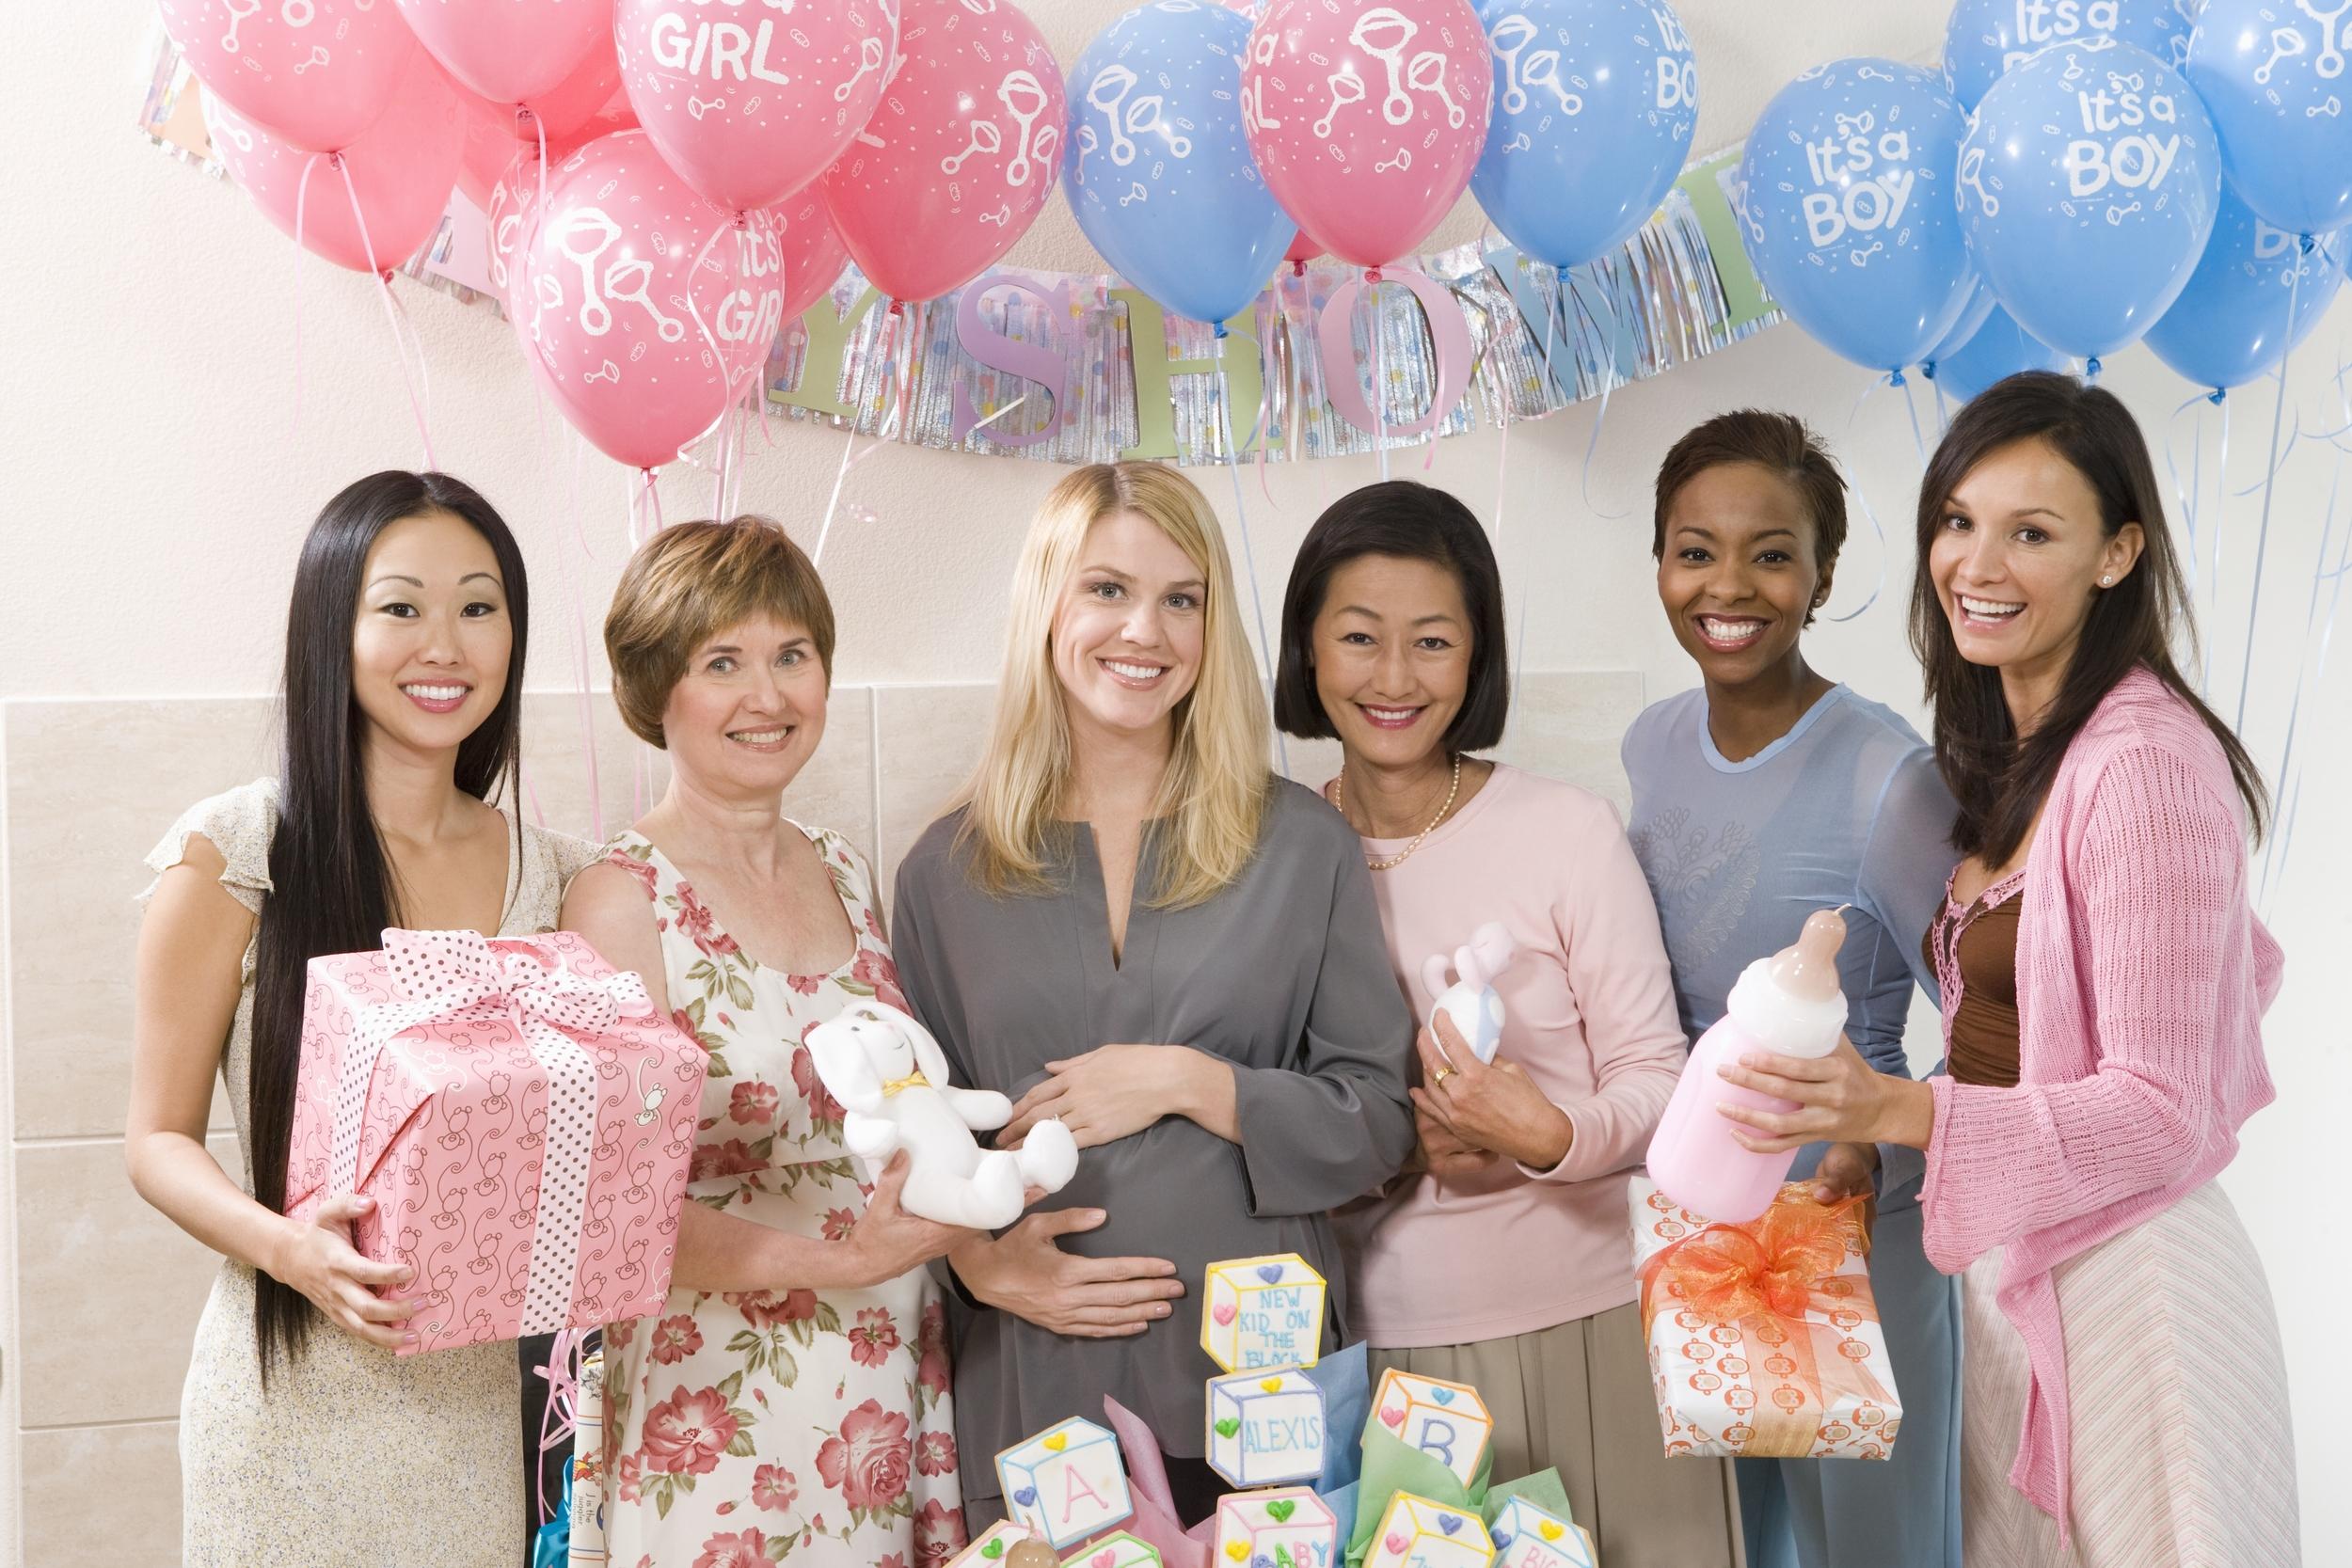 women at baby shower 2.jpg